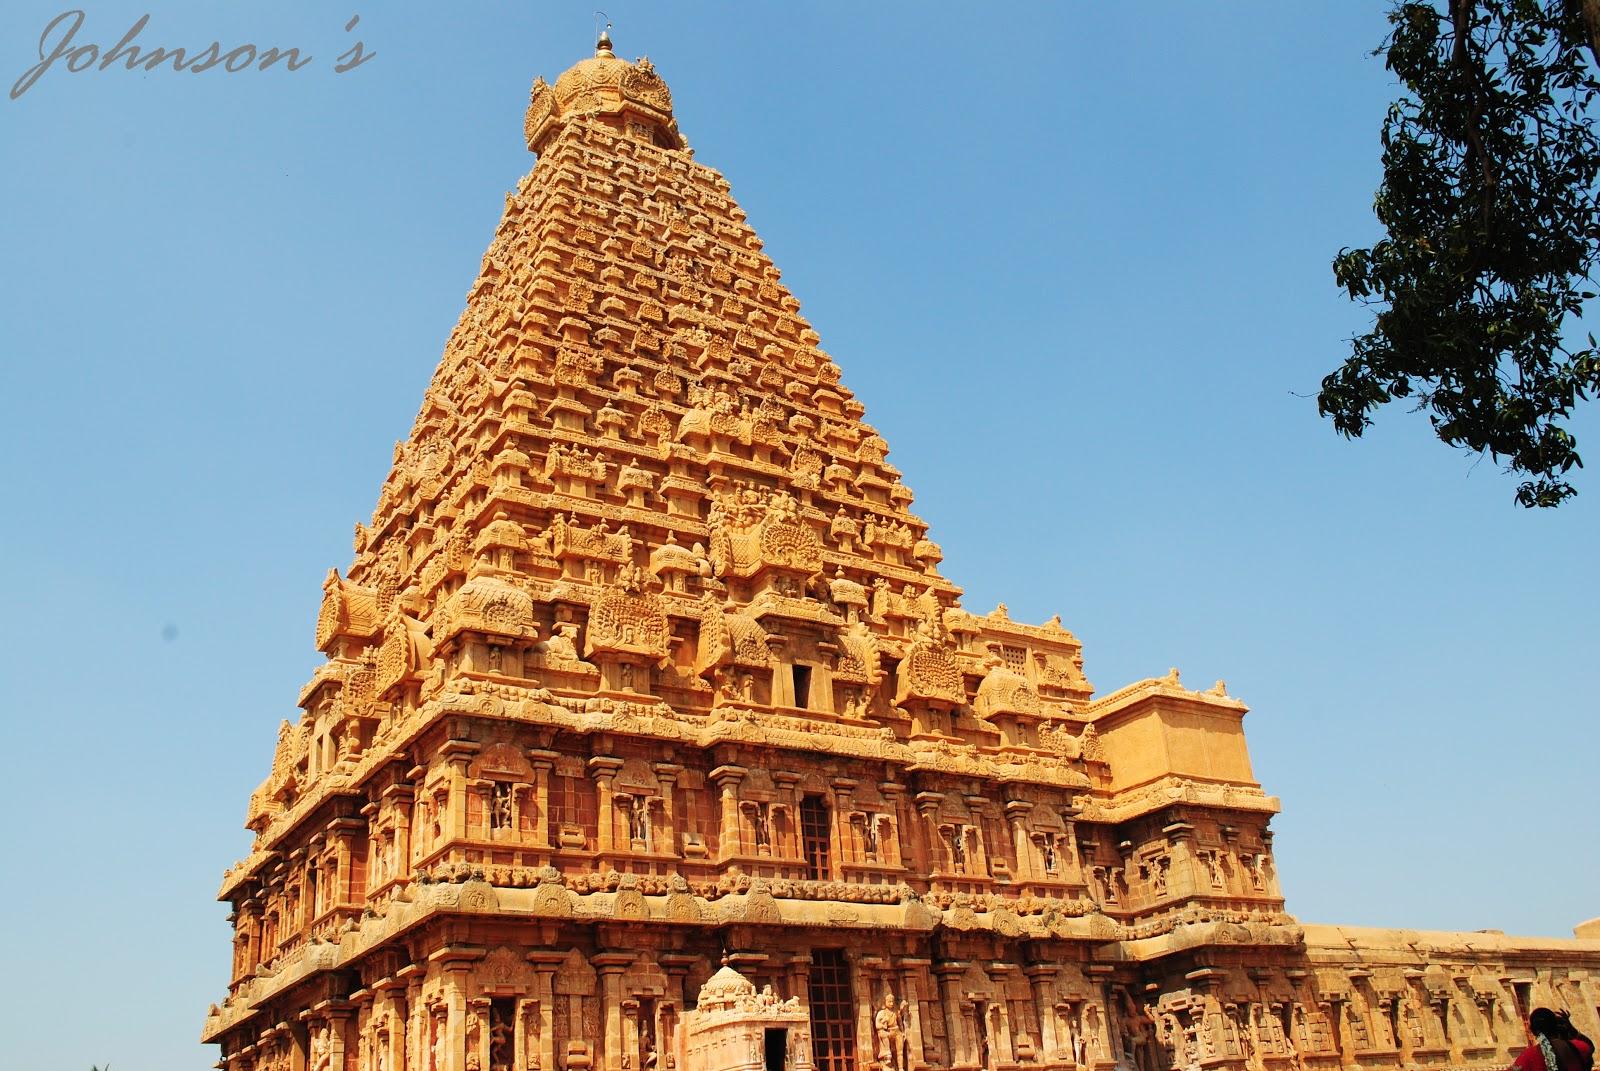 Johnson S Brihadeeswarar Temple Amp Saraboji Palace